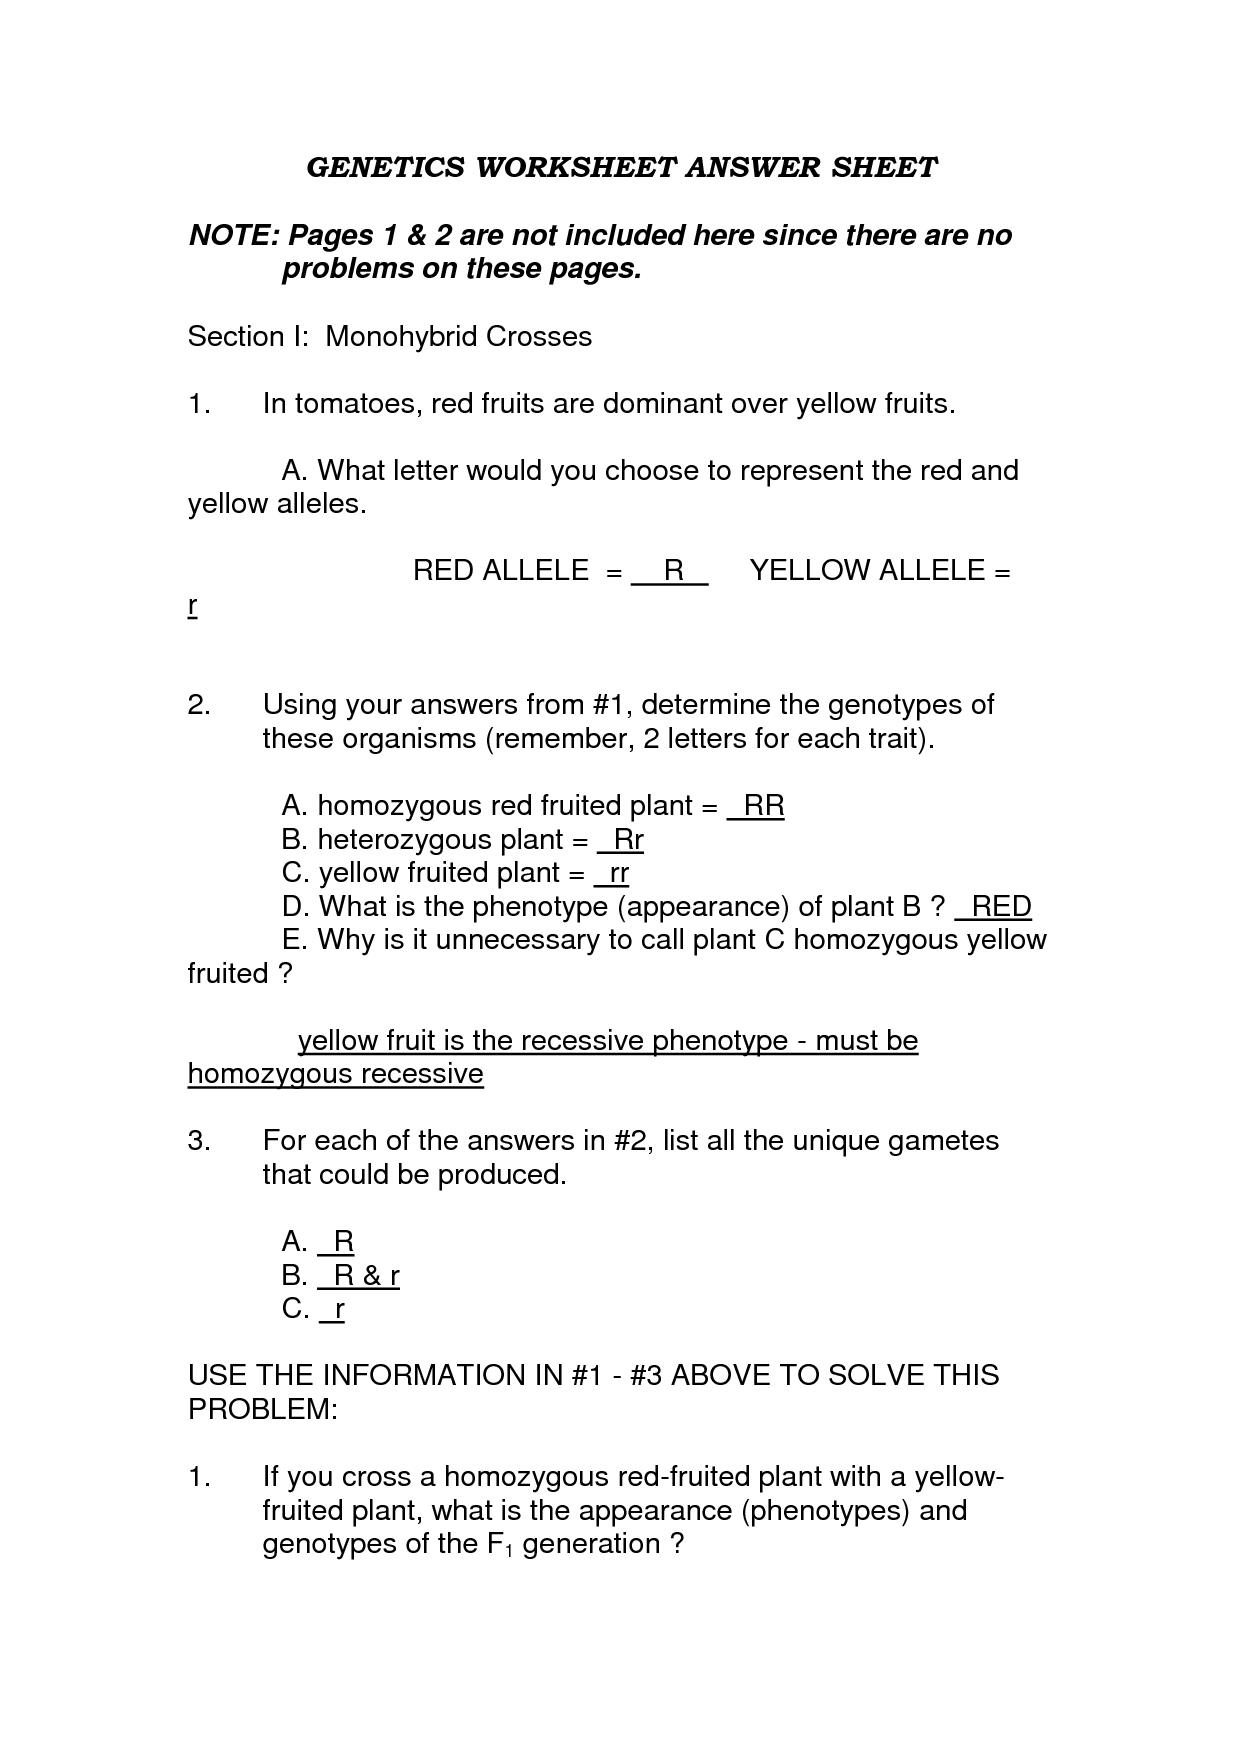 Monohybrid Cross Worksheets Answers Key